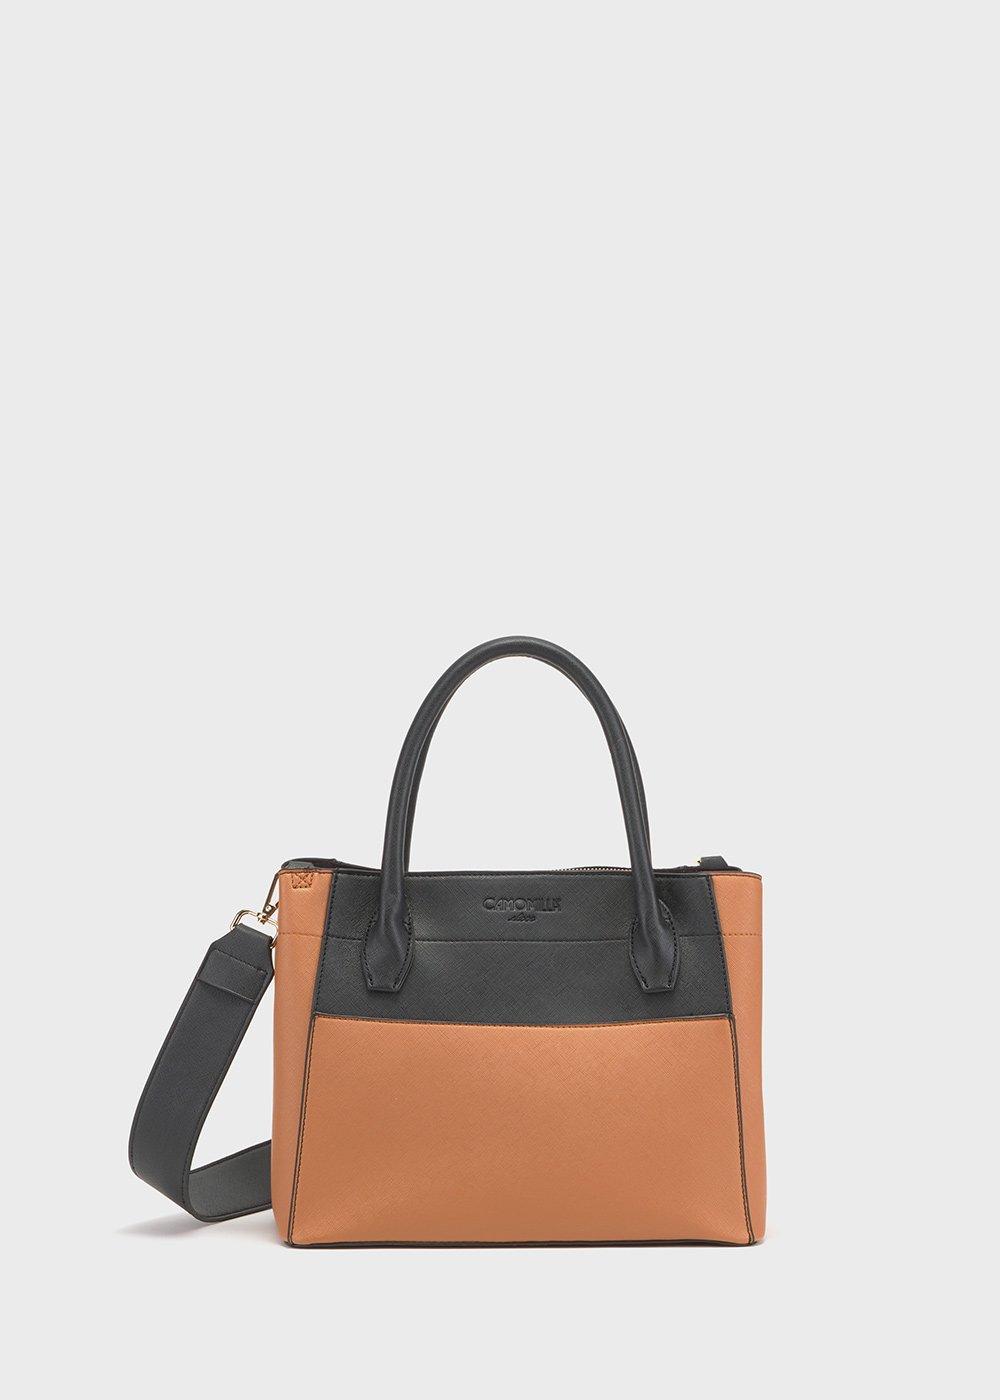 Two-tone Bleed bag - Suolo /   Black - Woman